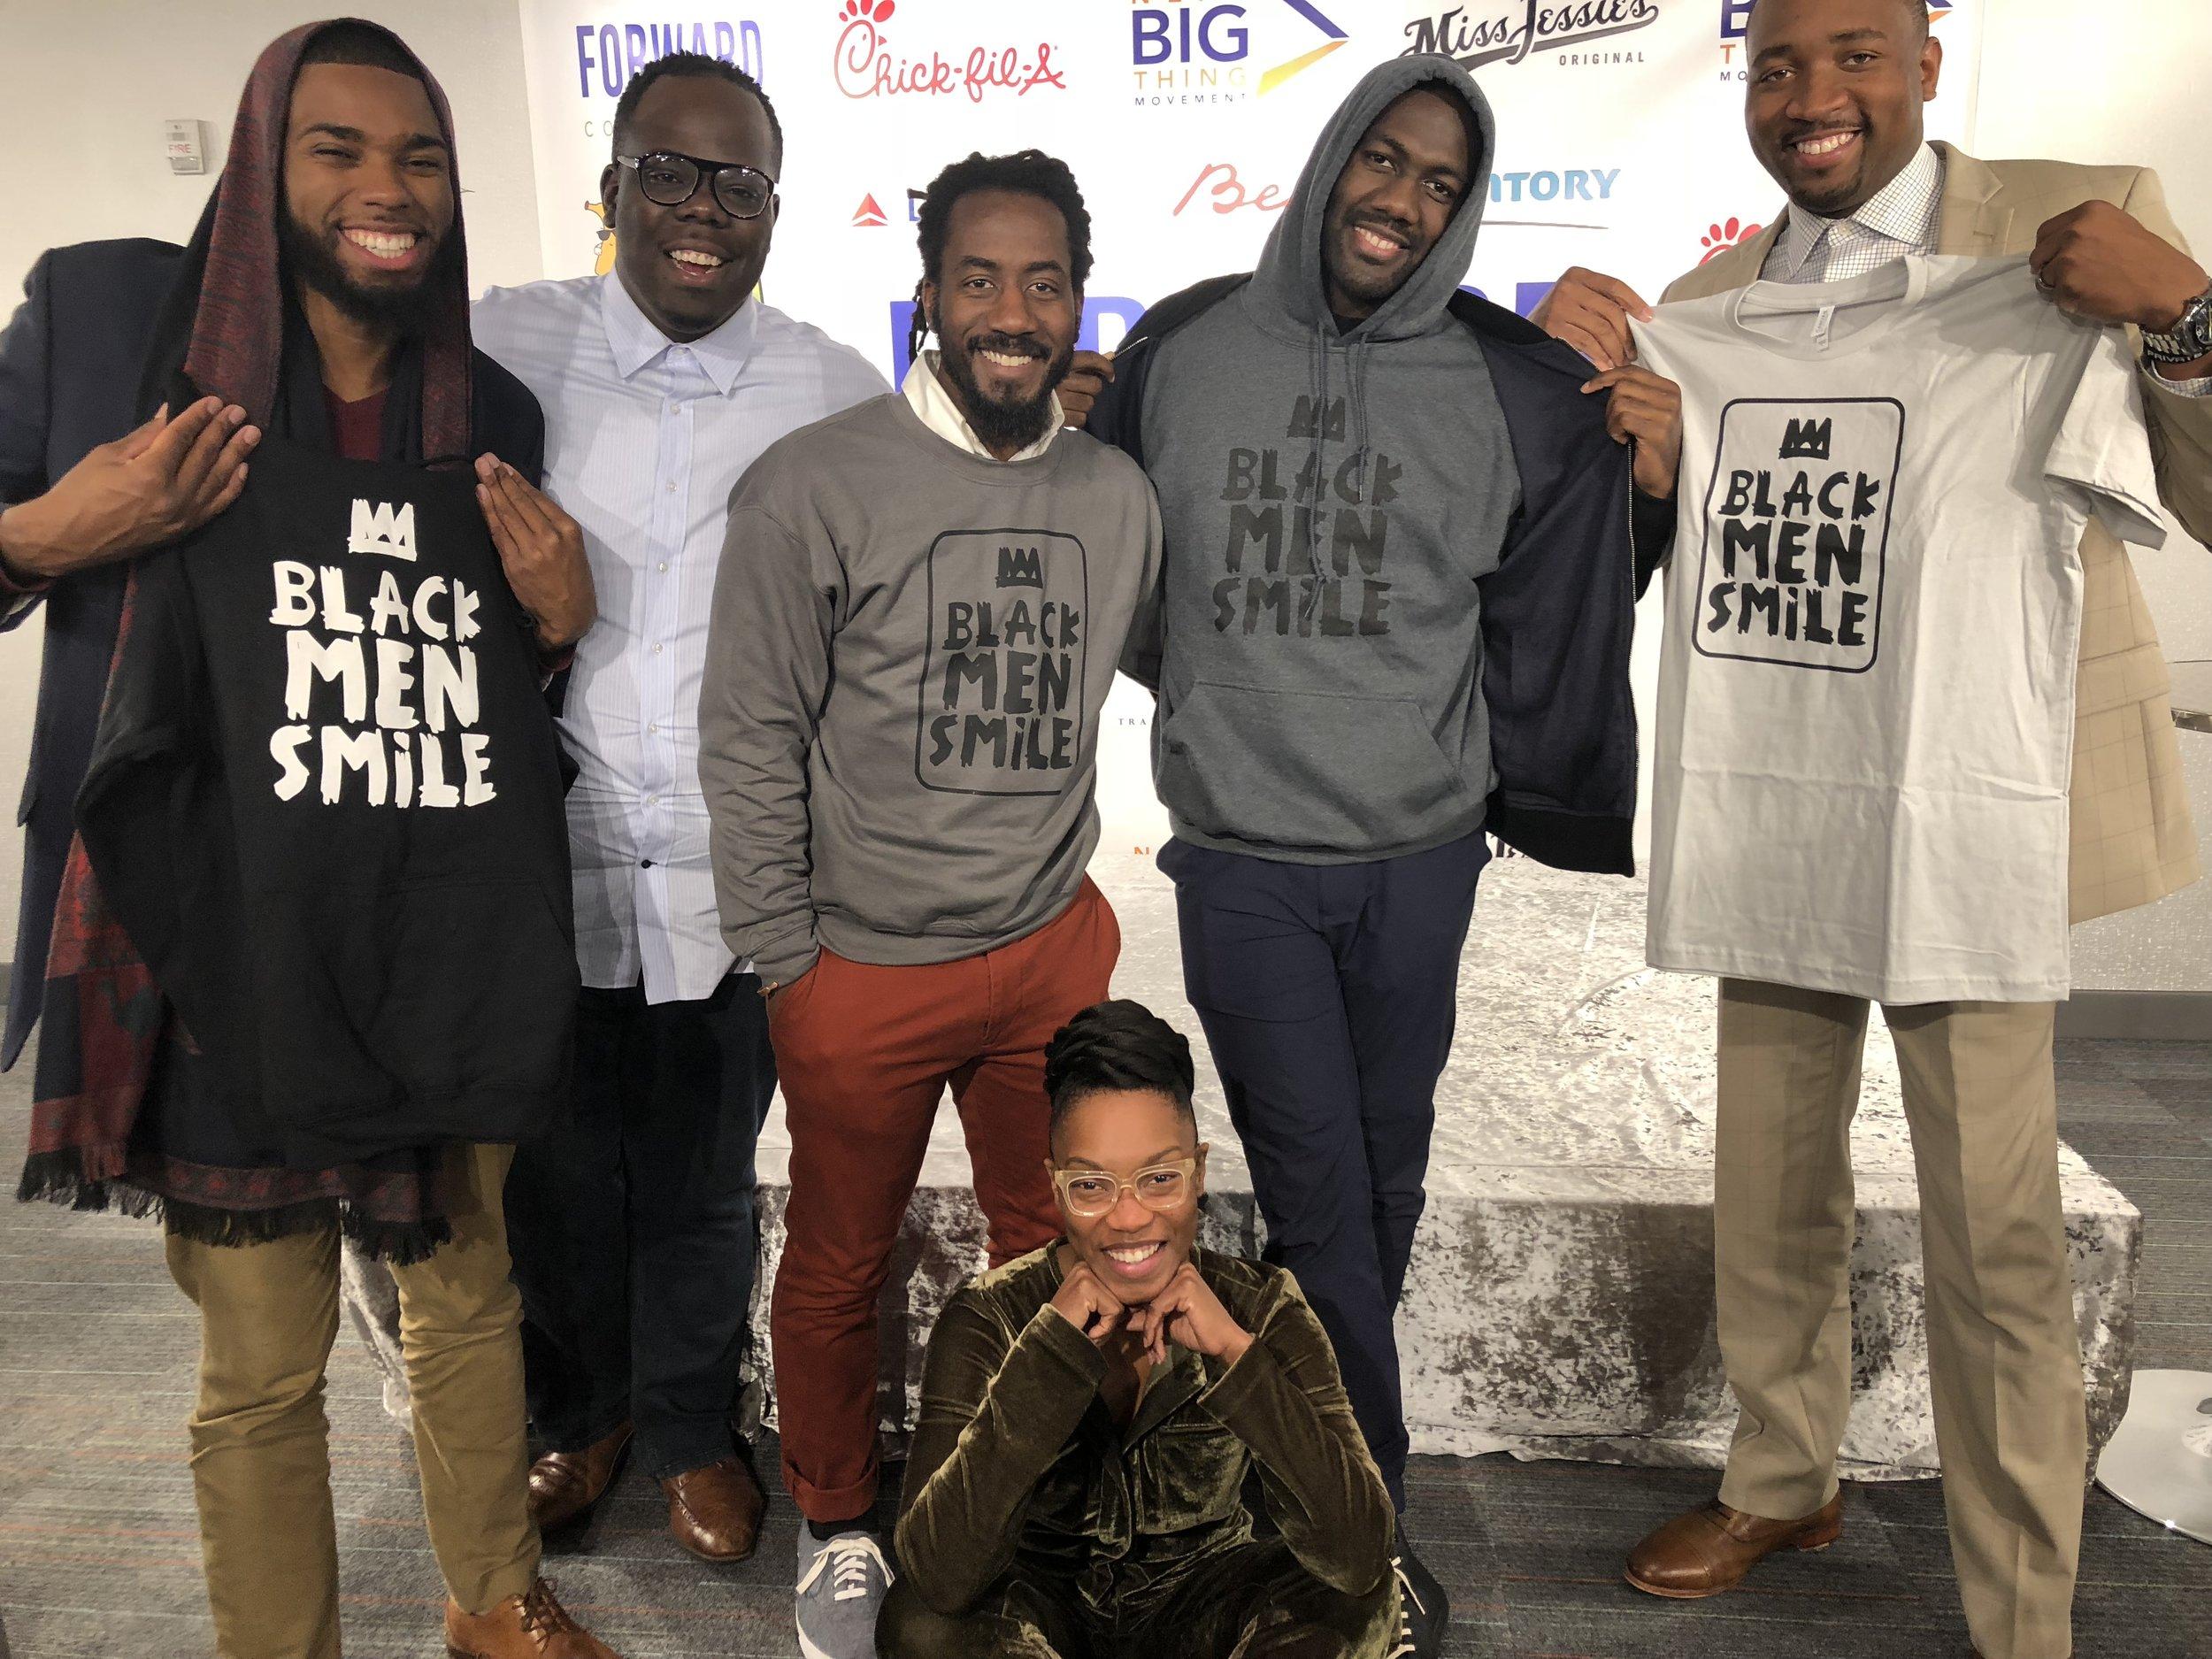 black-men-smile-forward-conference.jpg